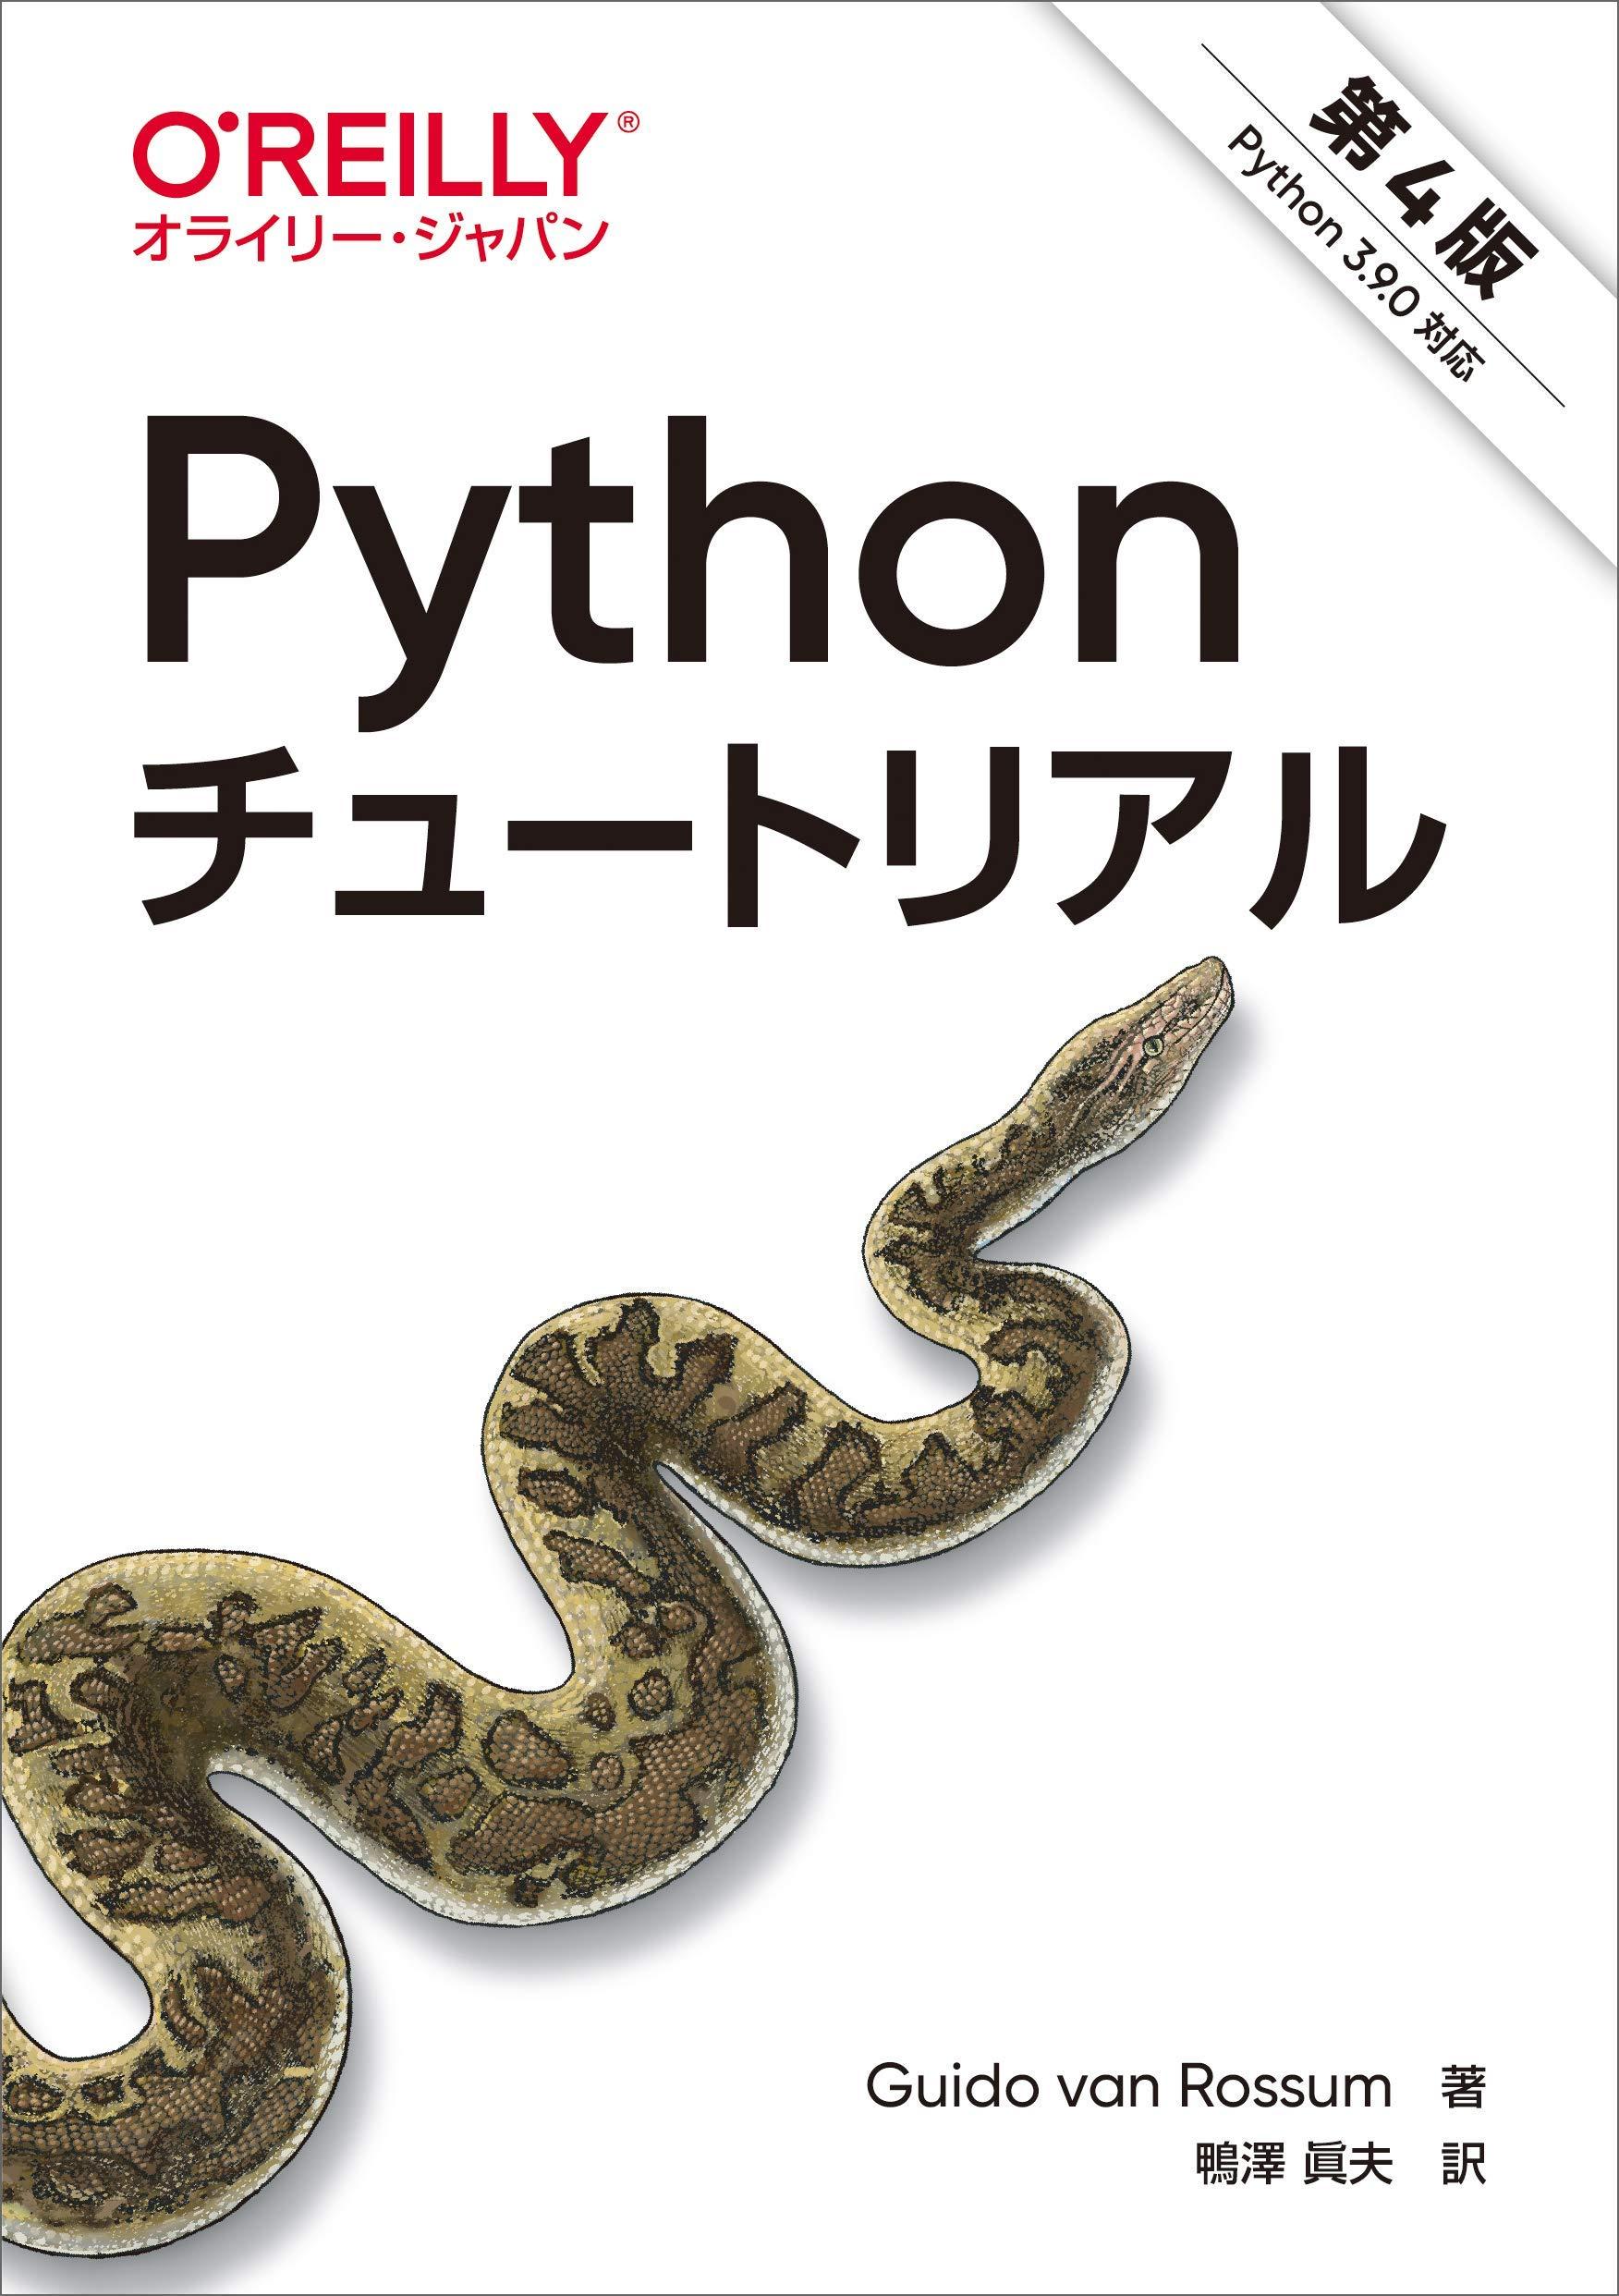 Pythonチュートリアル 第4版 | Guido van Rossum, 鴨澤 眞夫 |本 | 通販 | Amazon